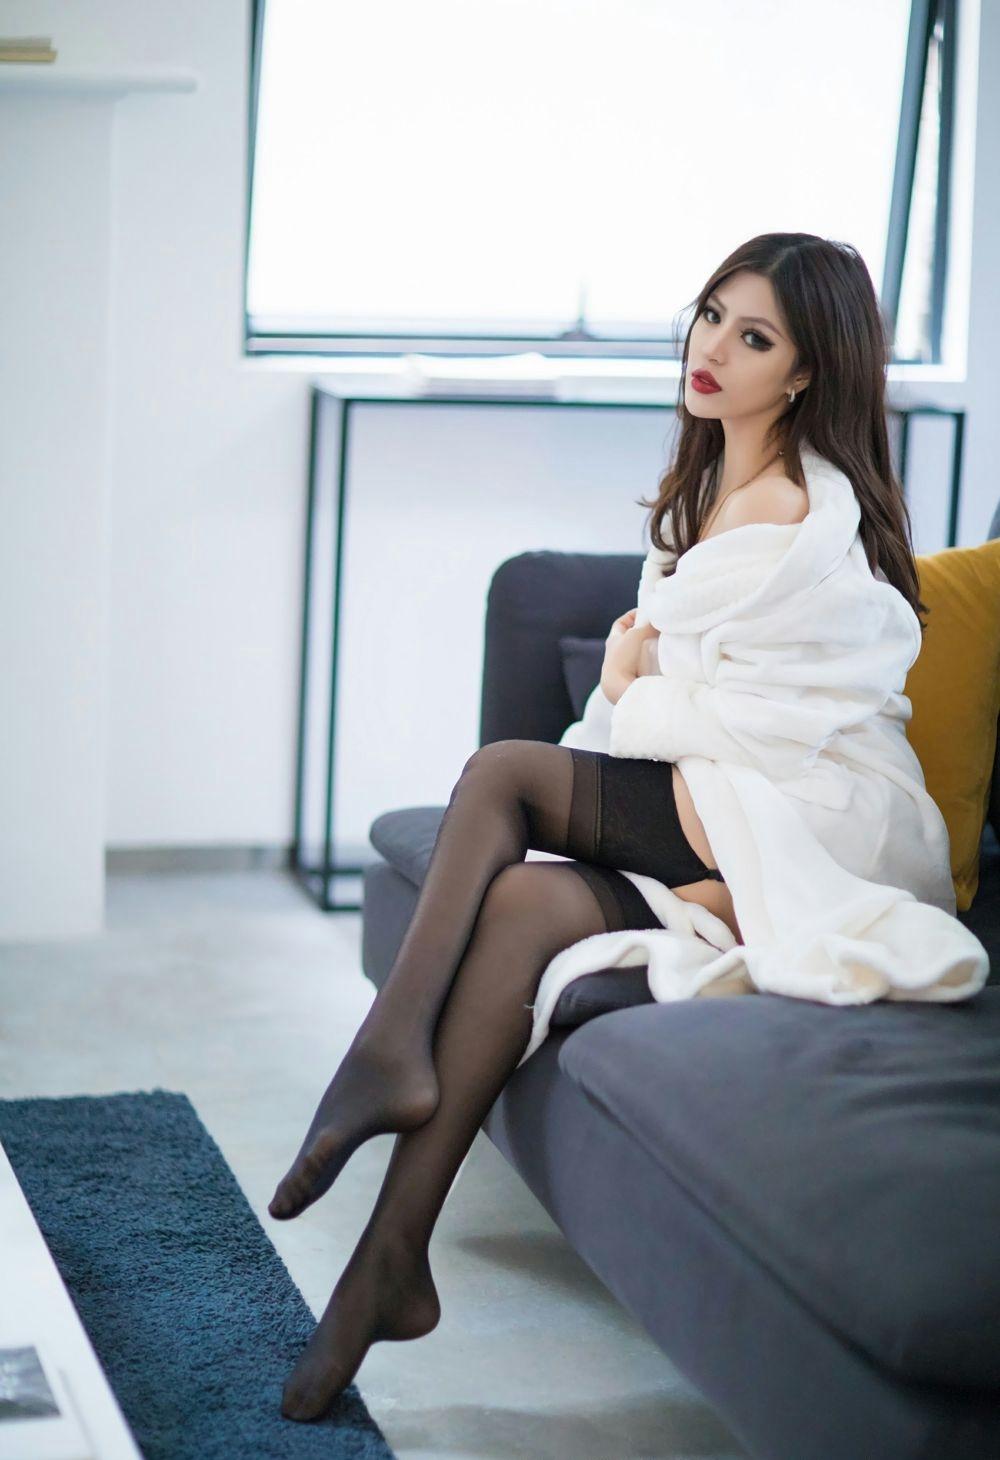 7SOE-346微博网红美女内衣秀